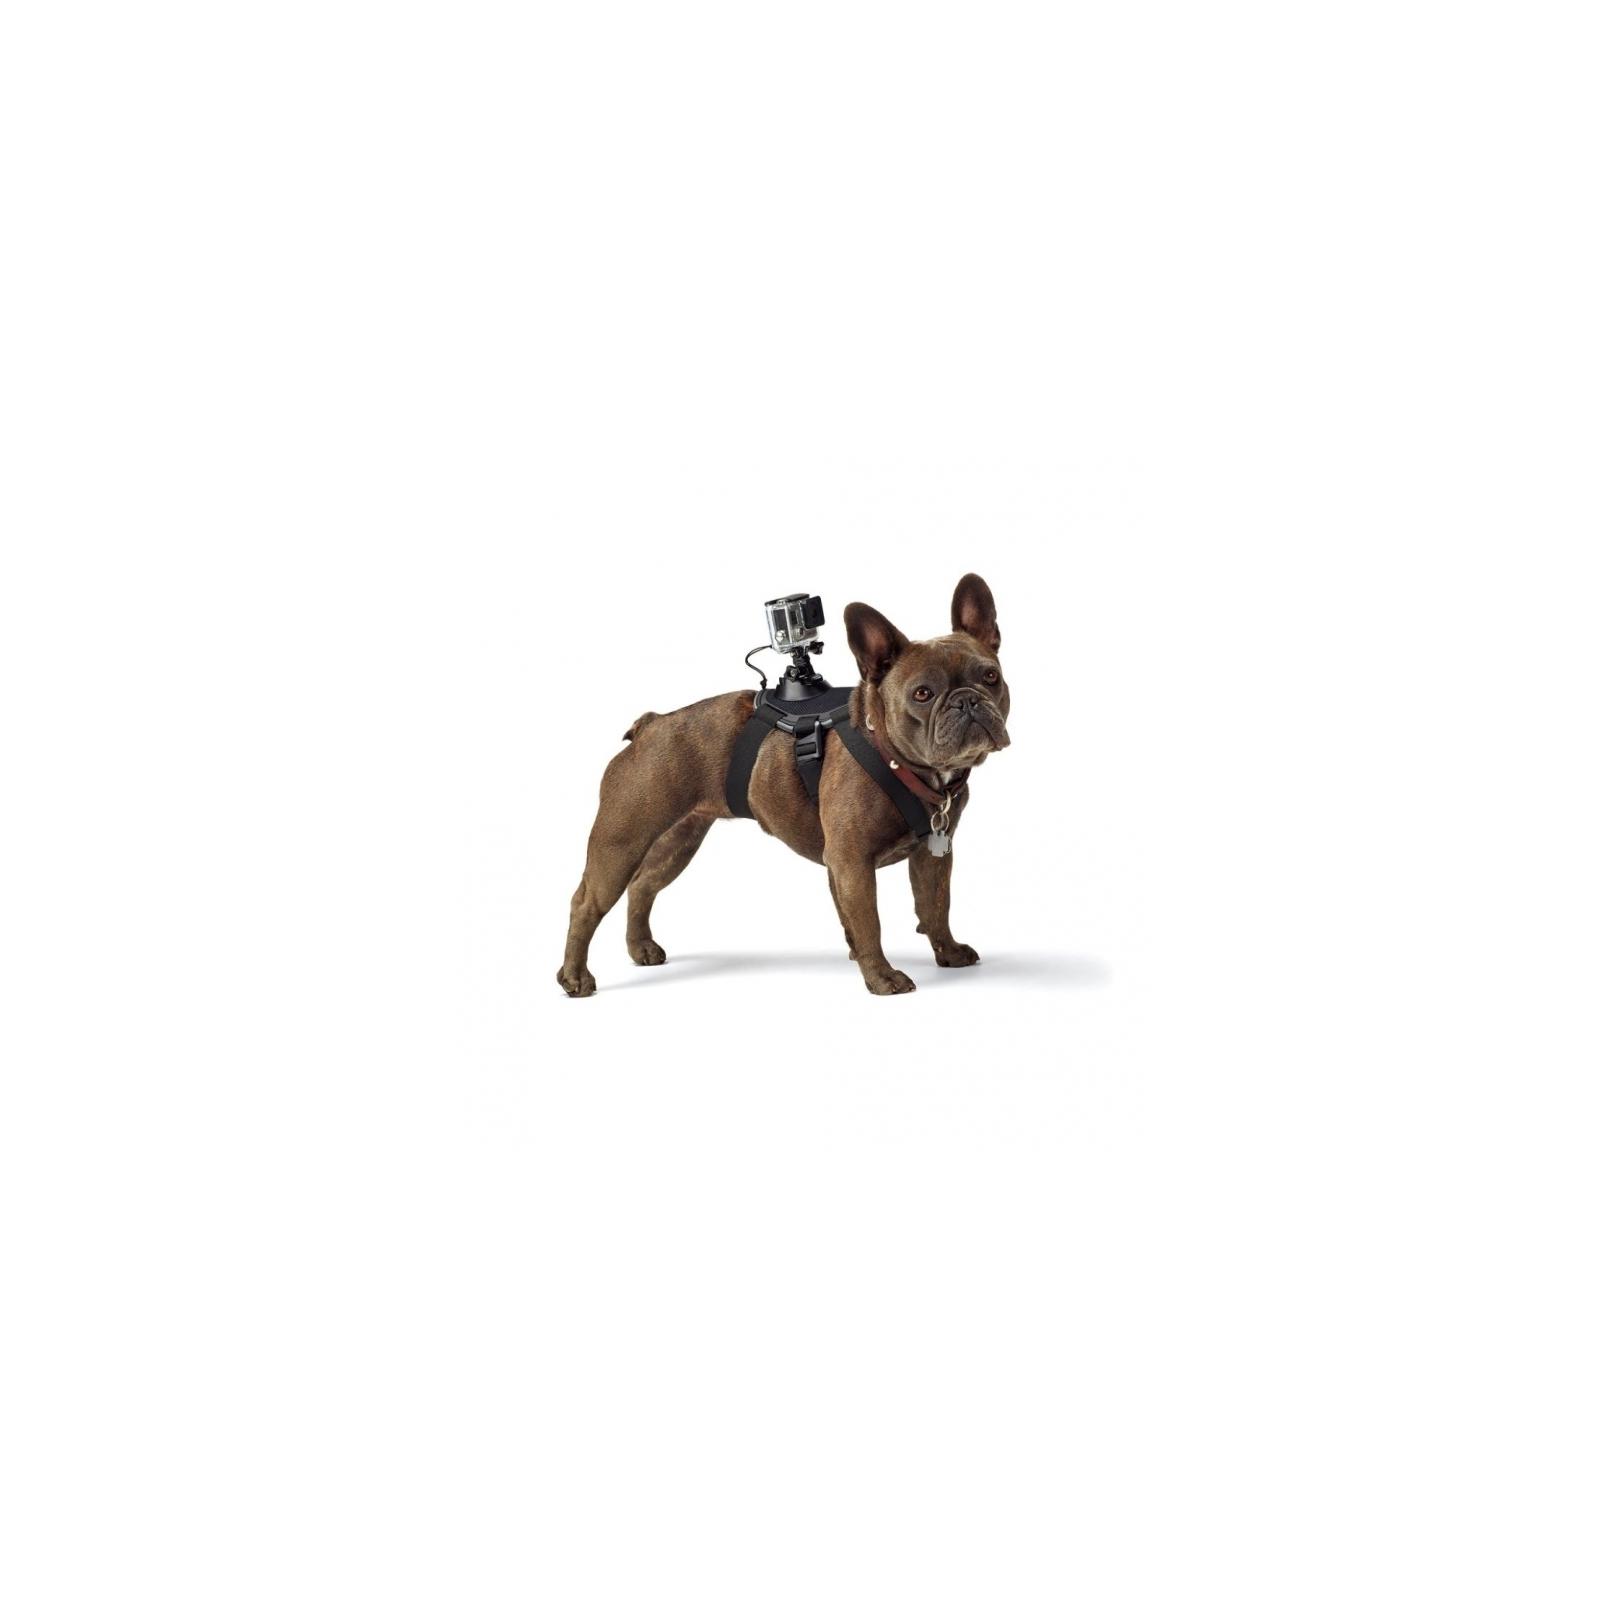 Аксессуар к экшн-камерам GoPro Fetch (ADOGM-001) изображение 2